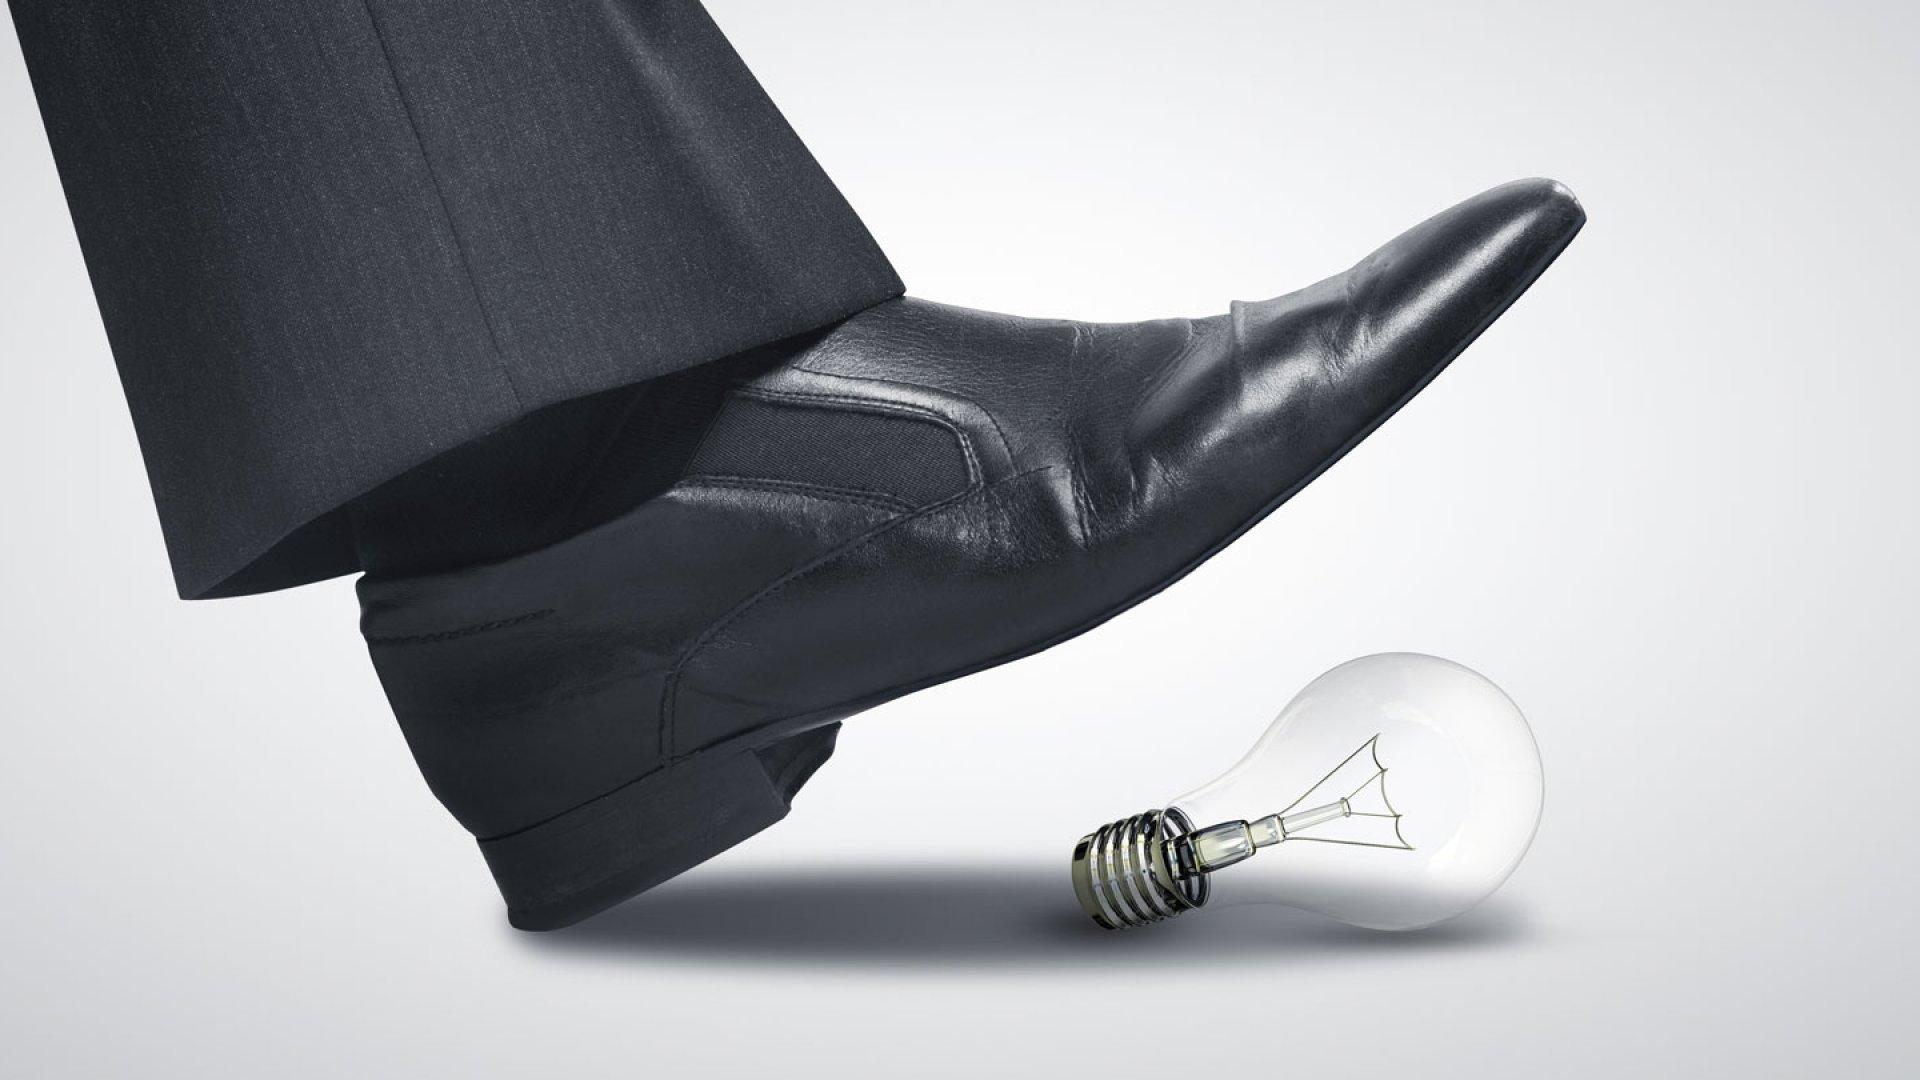 The 5 Attitudes That Stifle Creativity